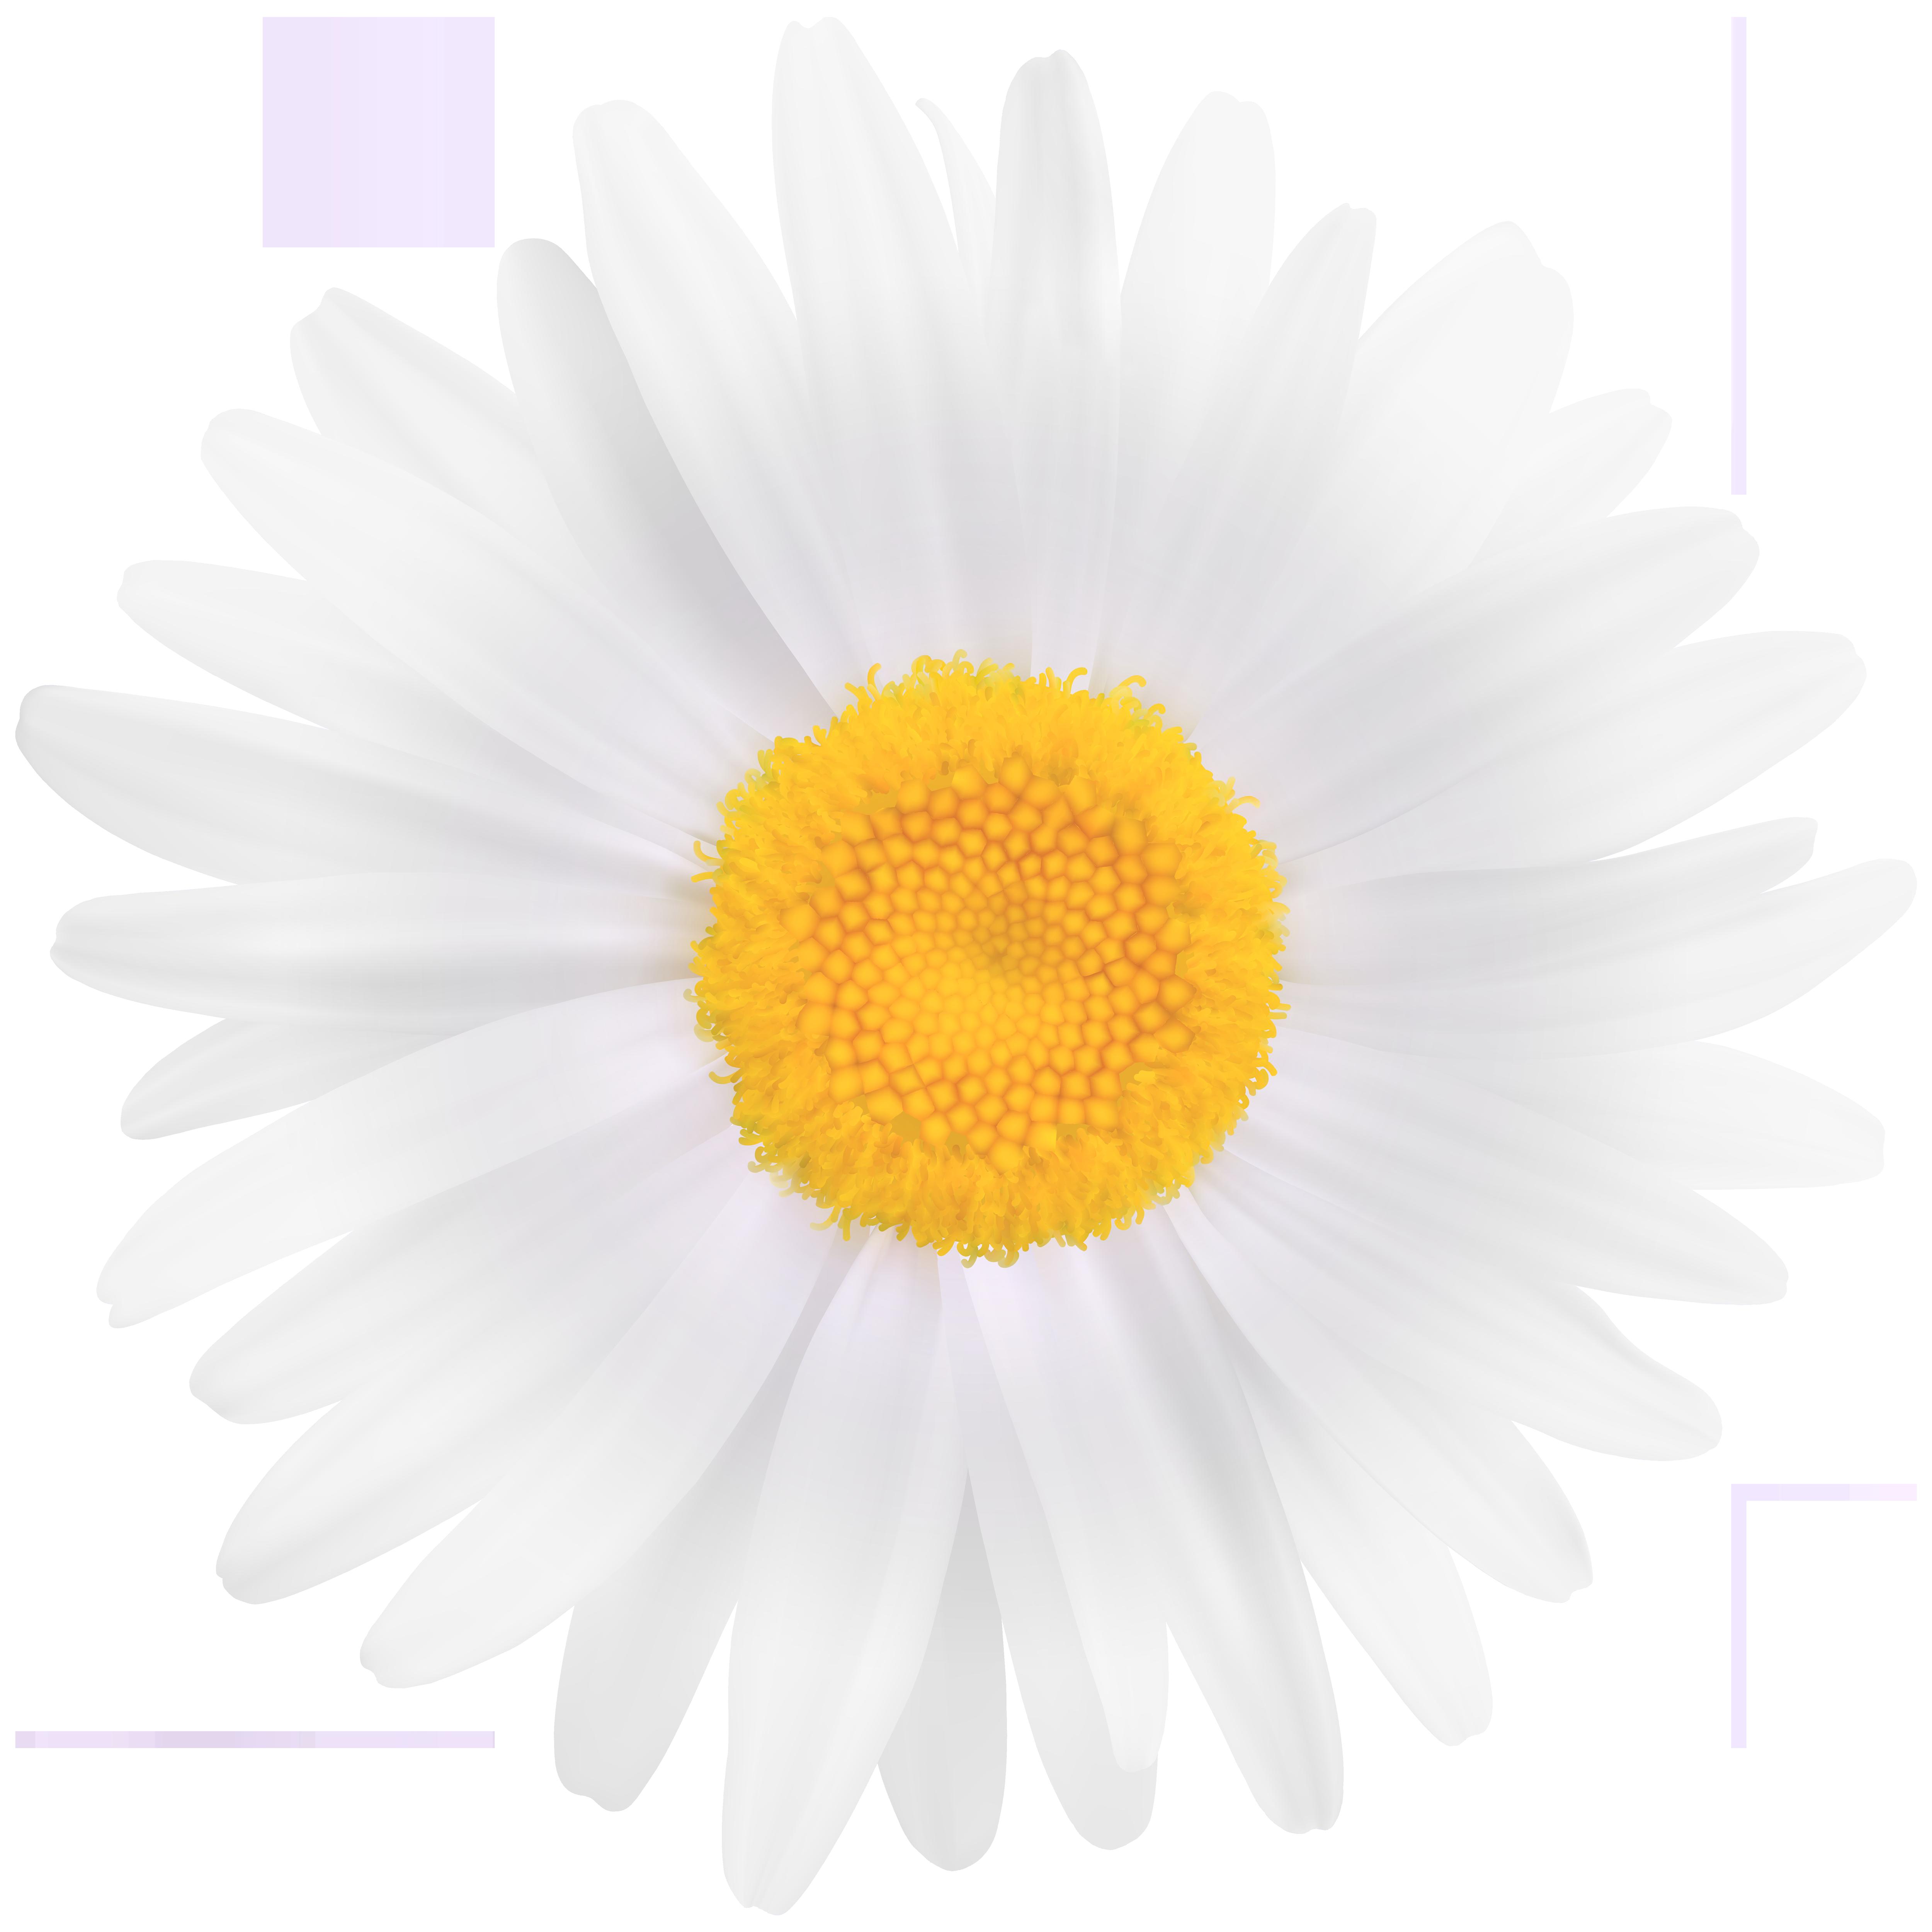 White daisy flower clipart image transparent stock White Daisy Flower PNG Clipart Image | Gallery Yopriceville ... image transparent stock